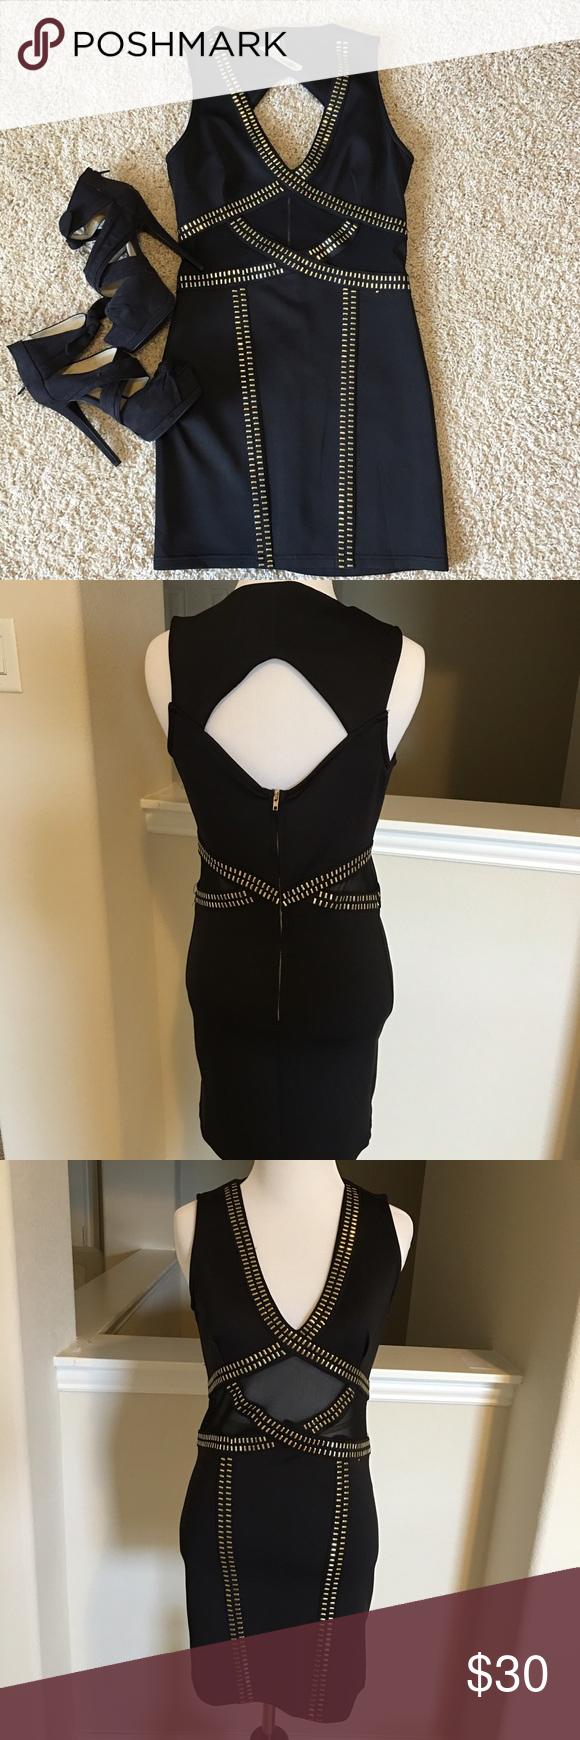 Nwt Boutique 5ive Black Dress With Gold Accents Clothes Design Fashion Black Dress [ 1740 x 580 Pixel ]